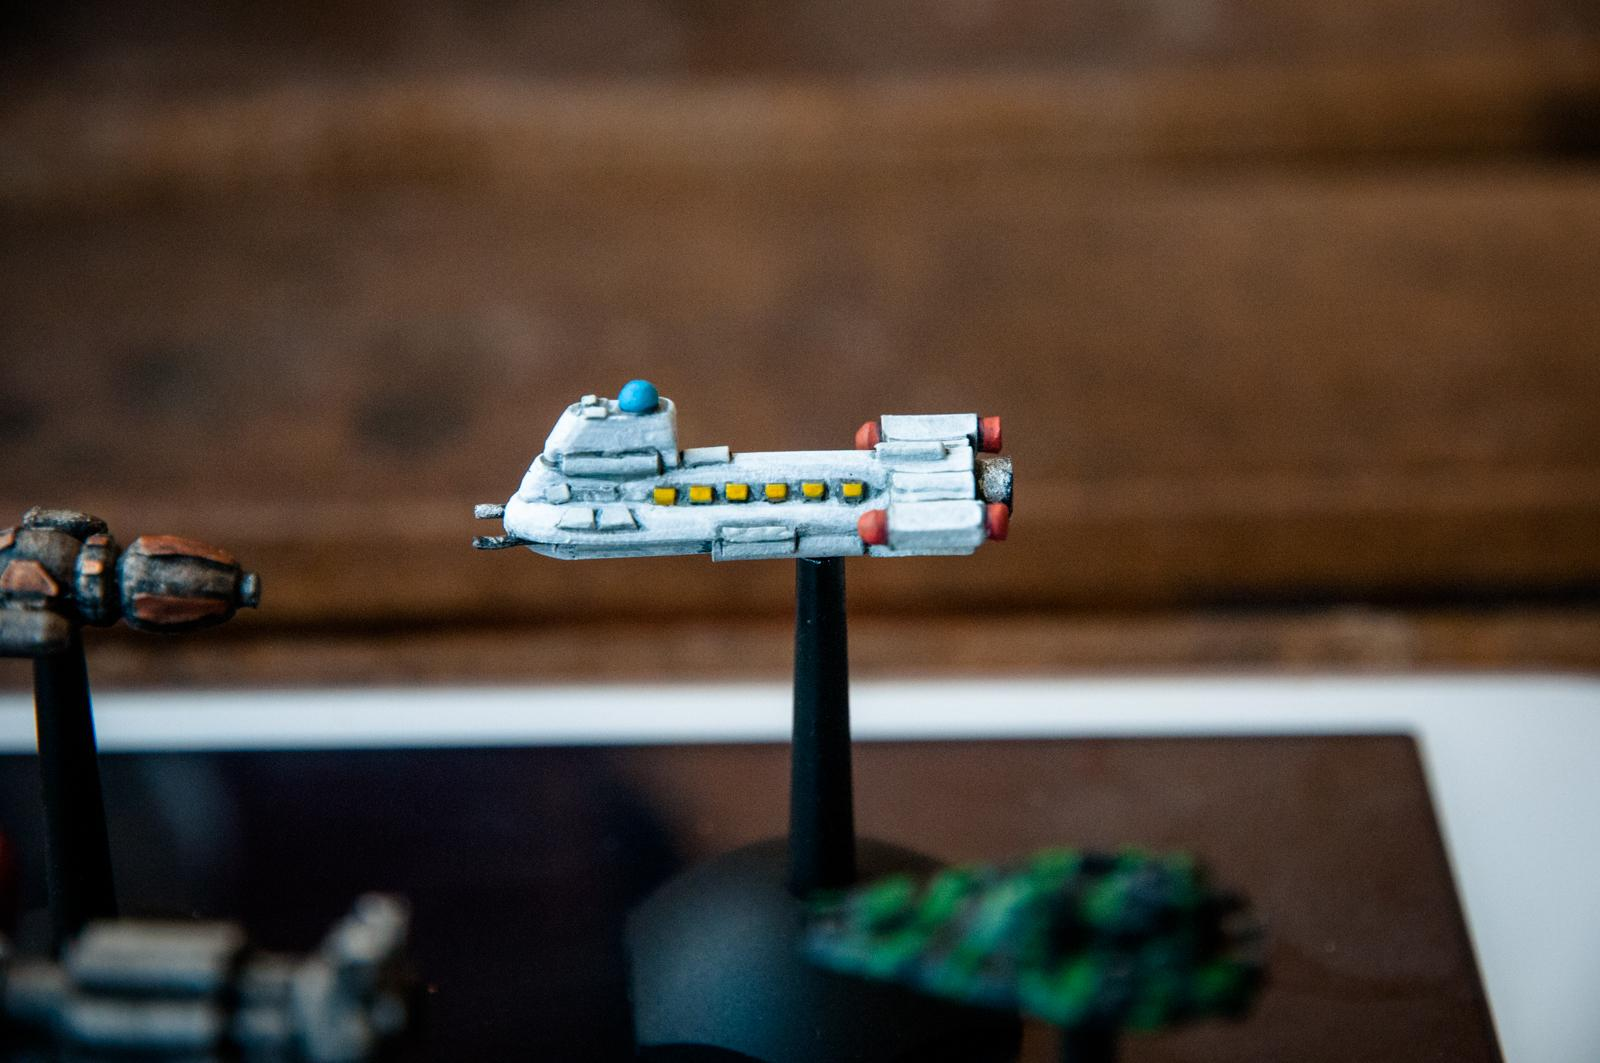 Civilians, Freighters, Full Thrust, Ground Zero Games, Pirates, Spaceships